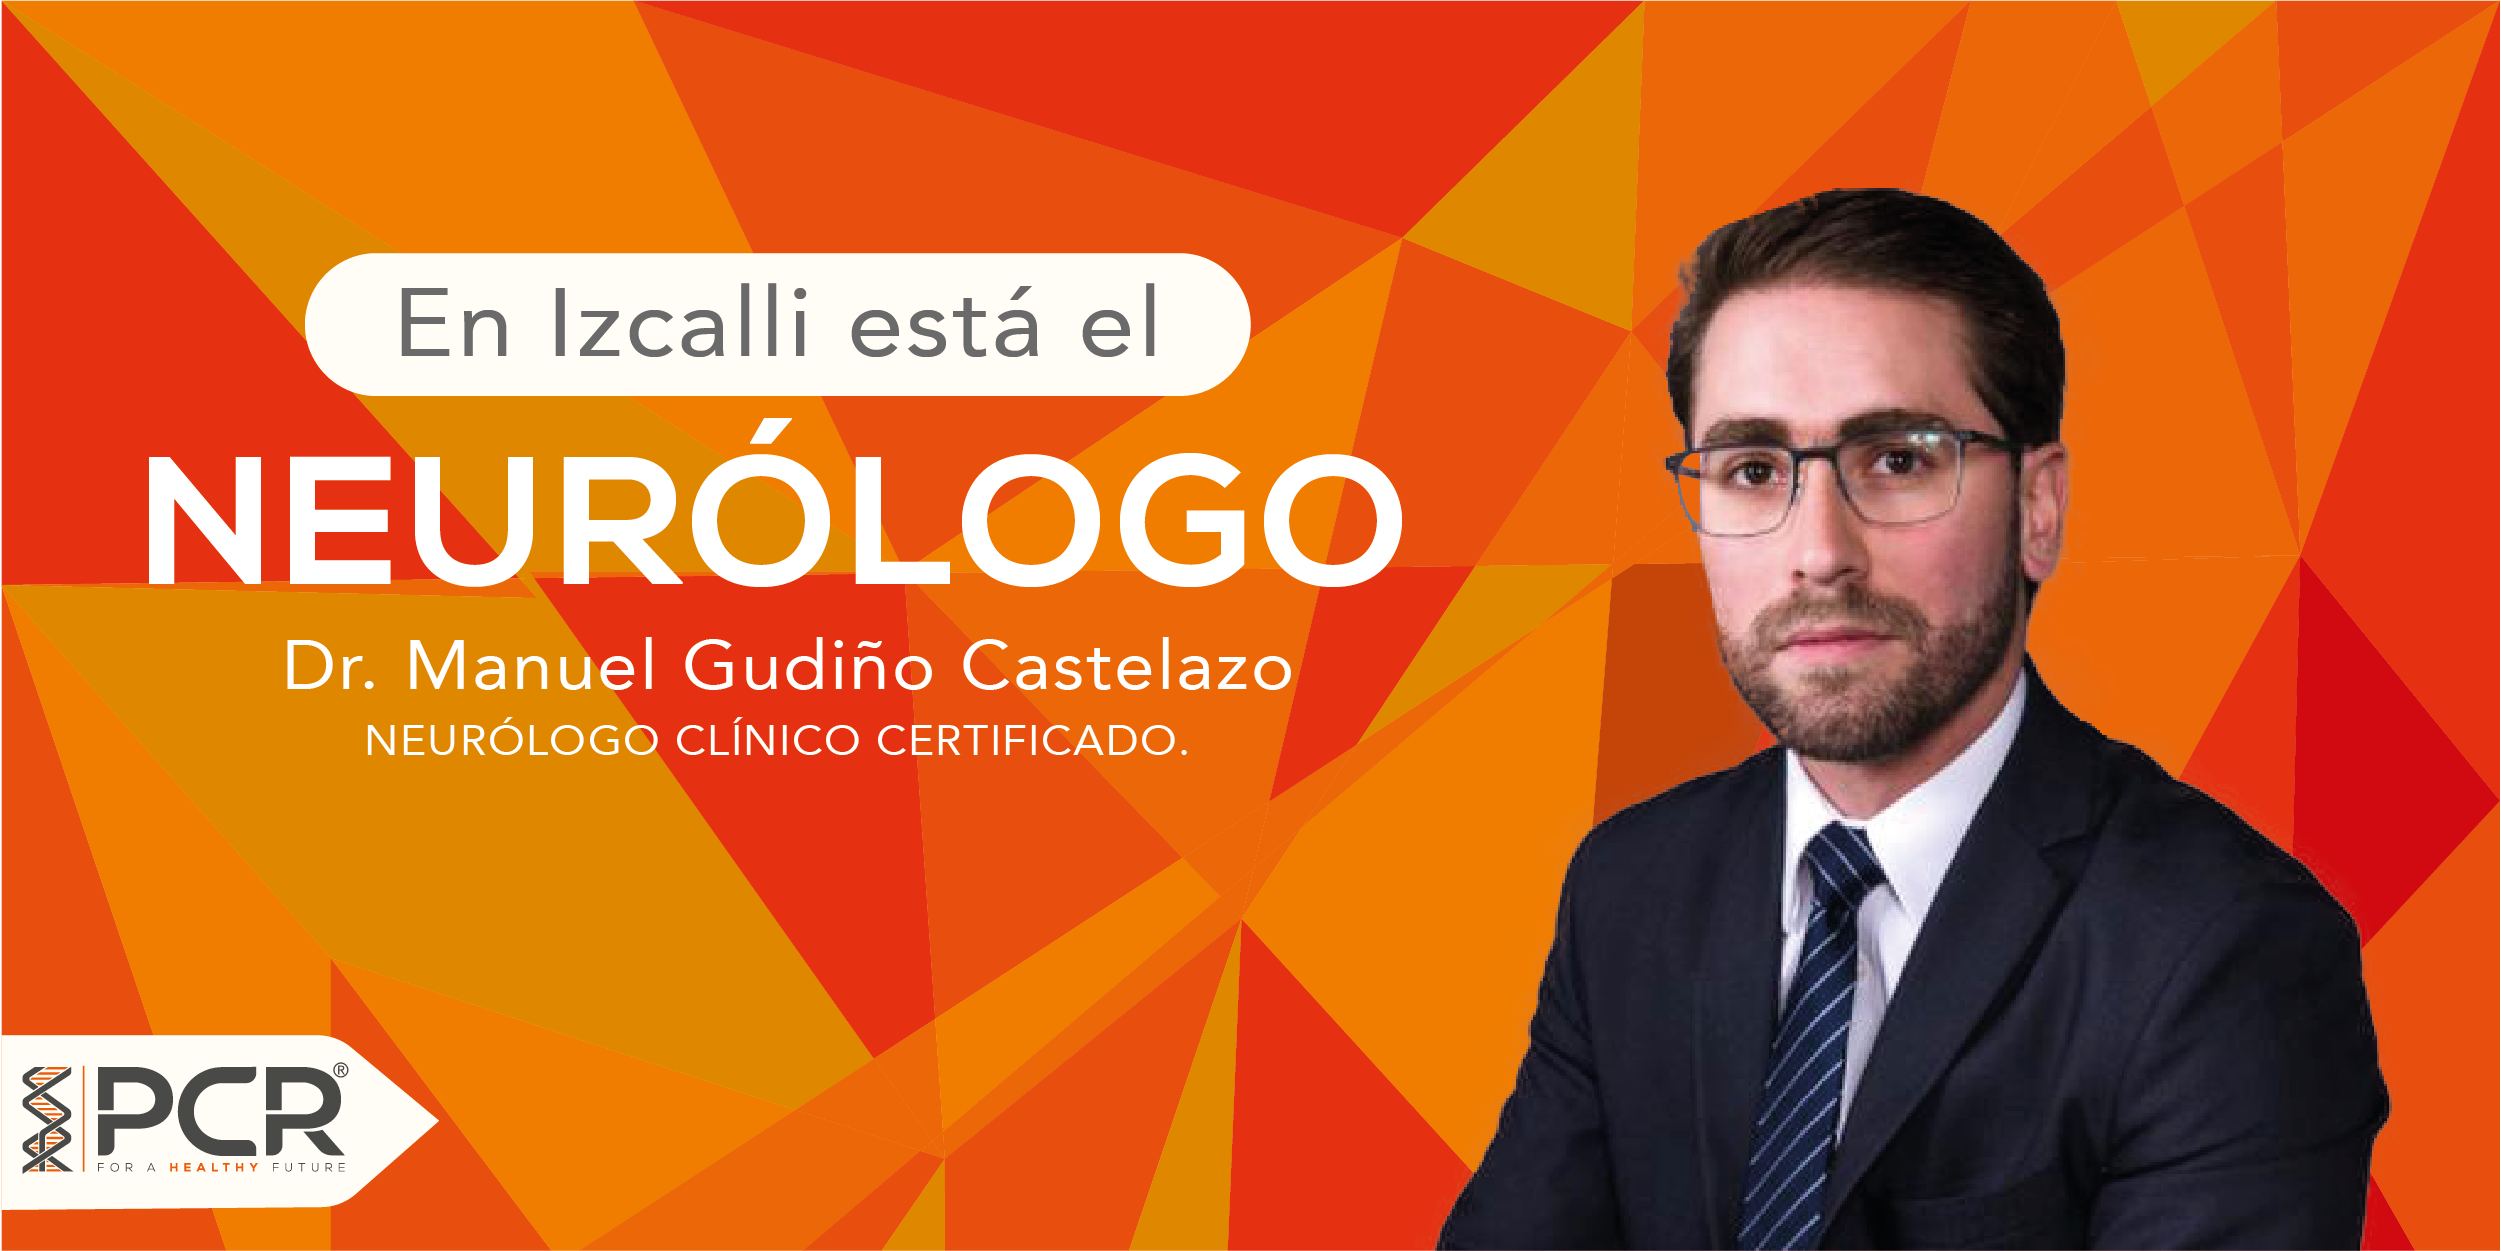 Dr. Manuel Gudiño Castelazo